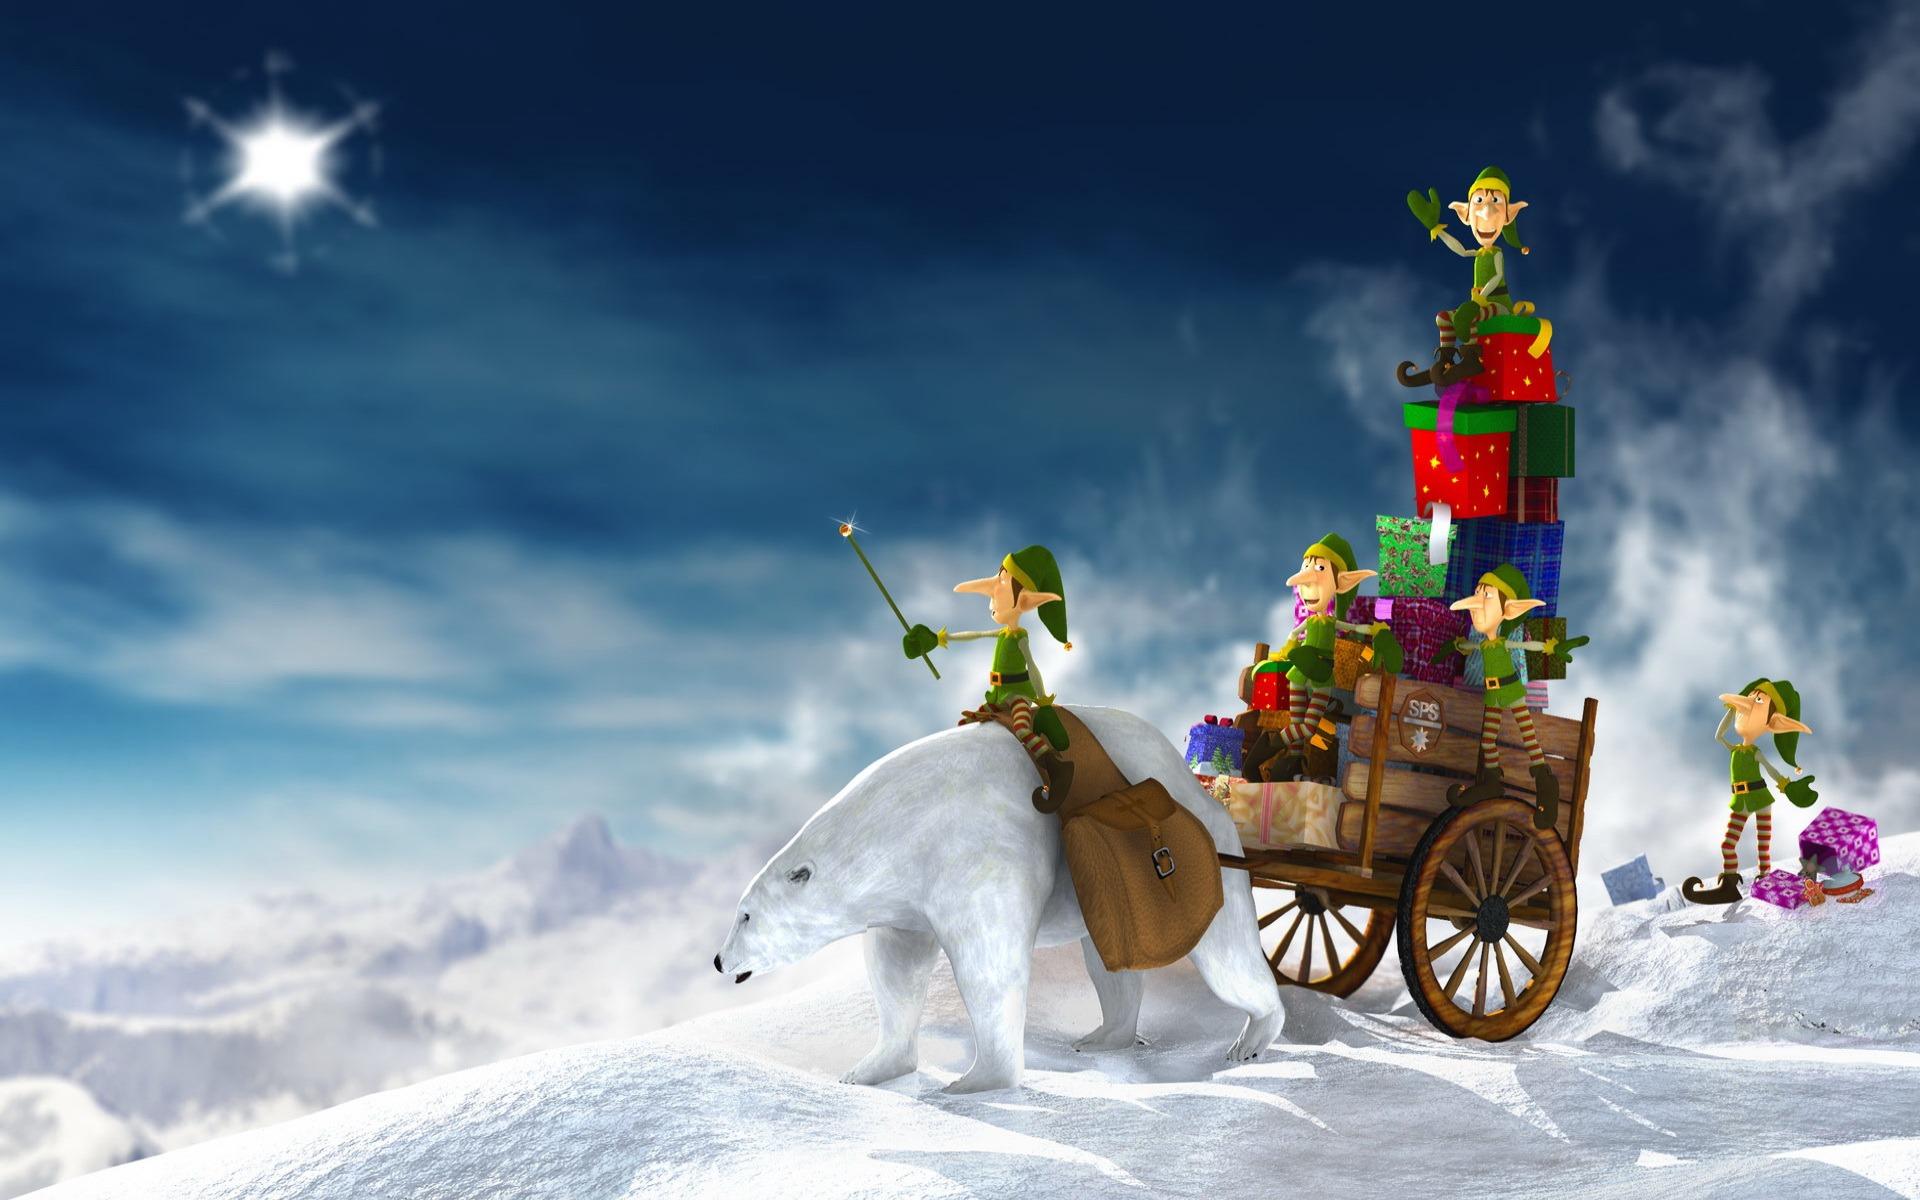 Christmas - Wallpapers, Pictures, Pics, Images, Photos | Desktop ...